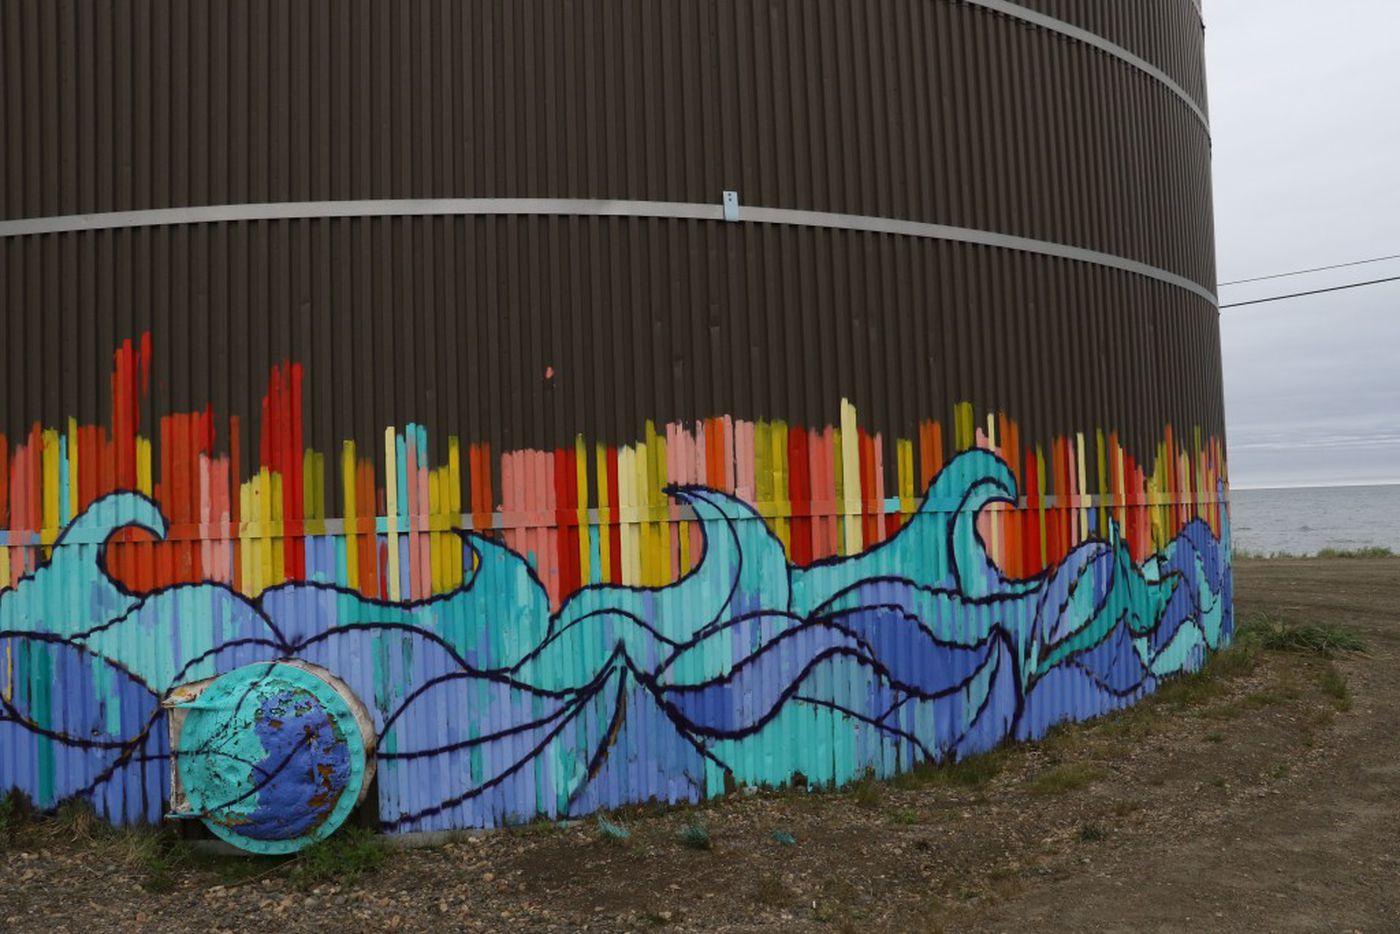 Water tank mural painted by the kids in Deering, Alaska. (Photo by Bailey Berg / Alaska Dispatch News)